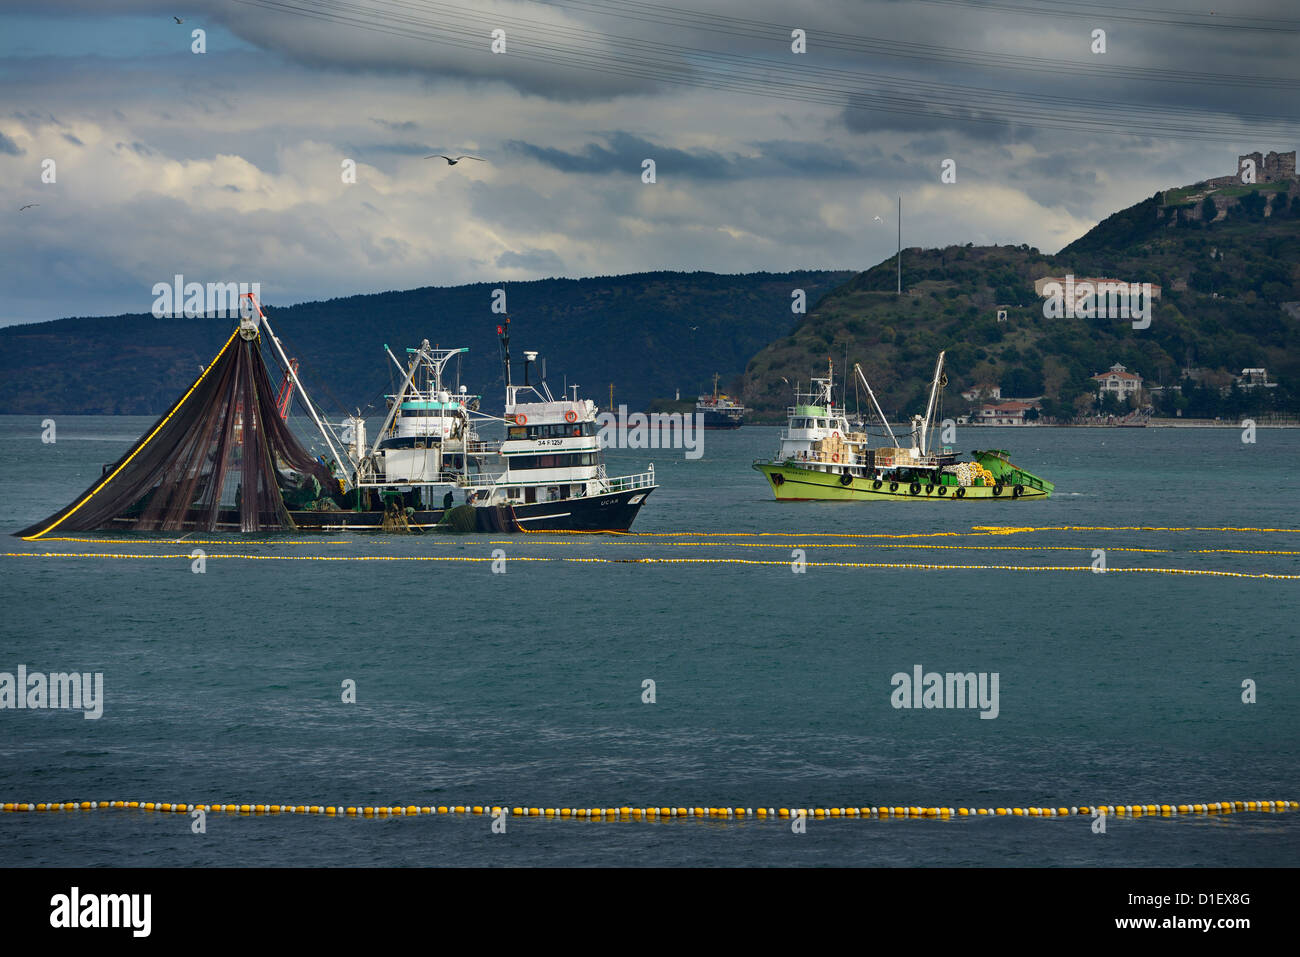 Purse Seine fishing boats on the Bosphorus Strait with Yoros Castle Turkey - Stock Image